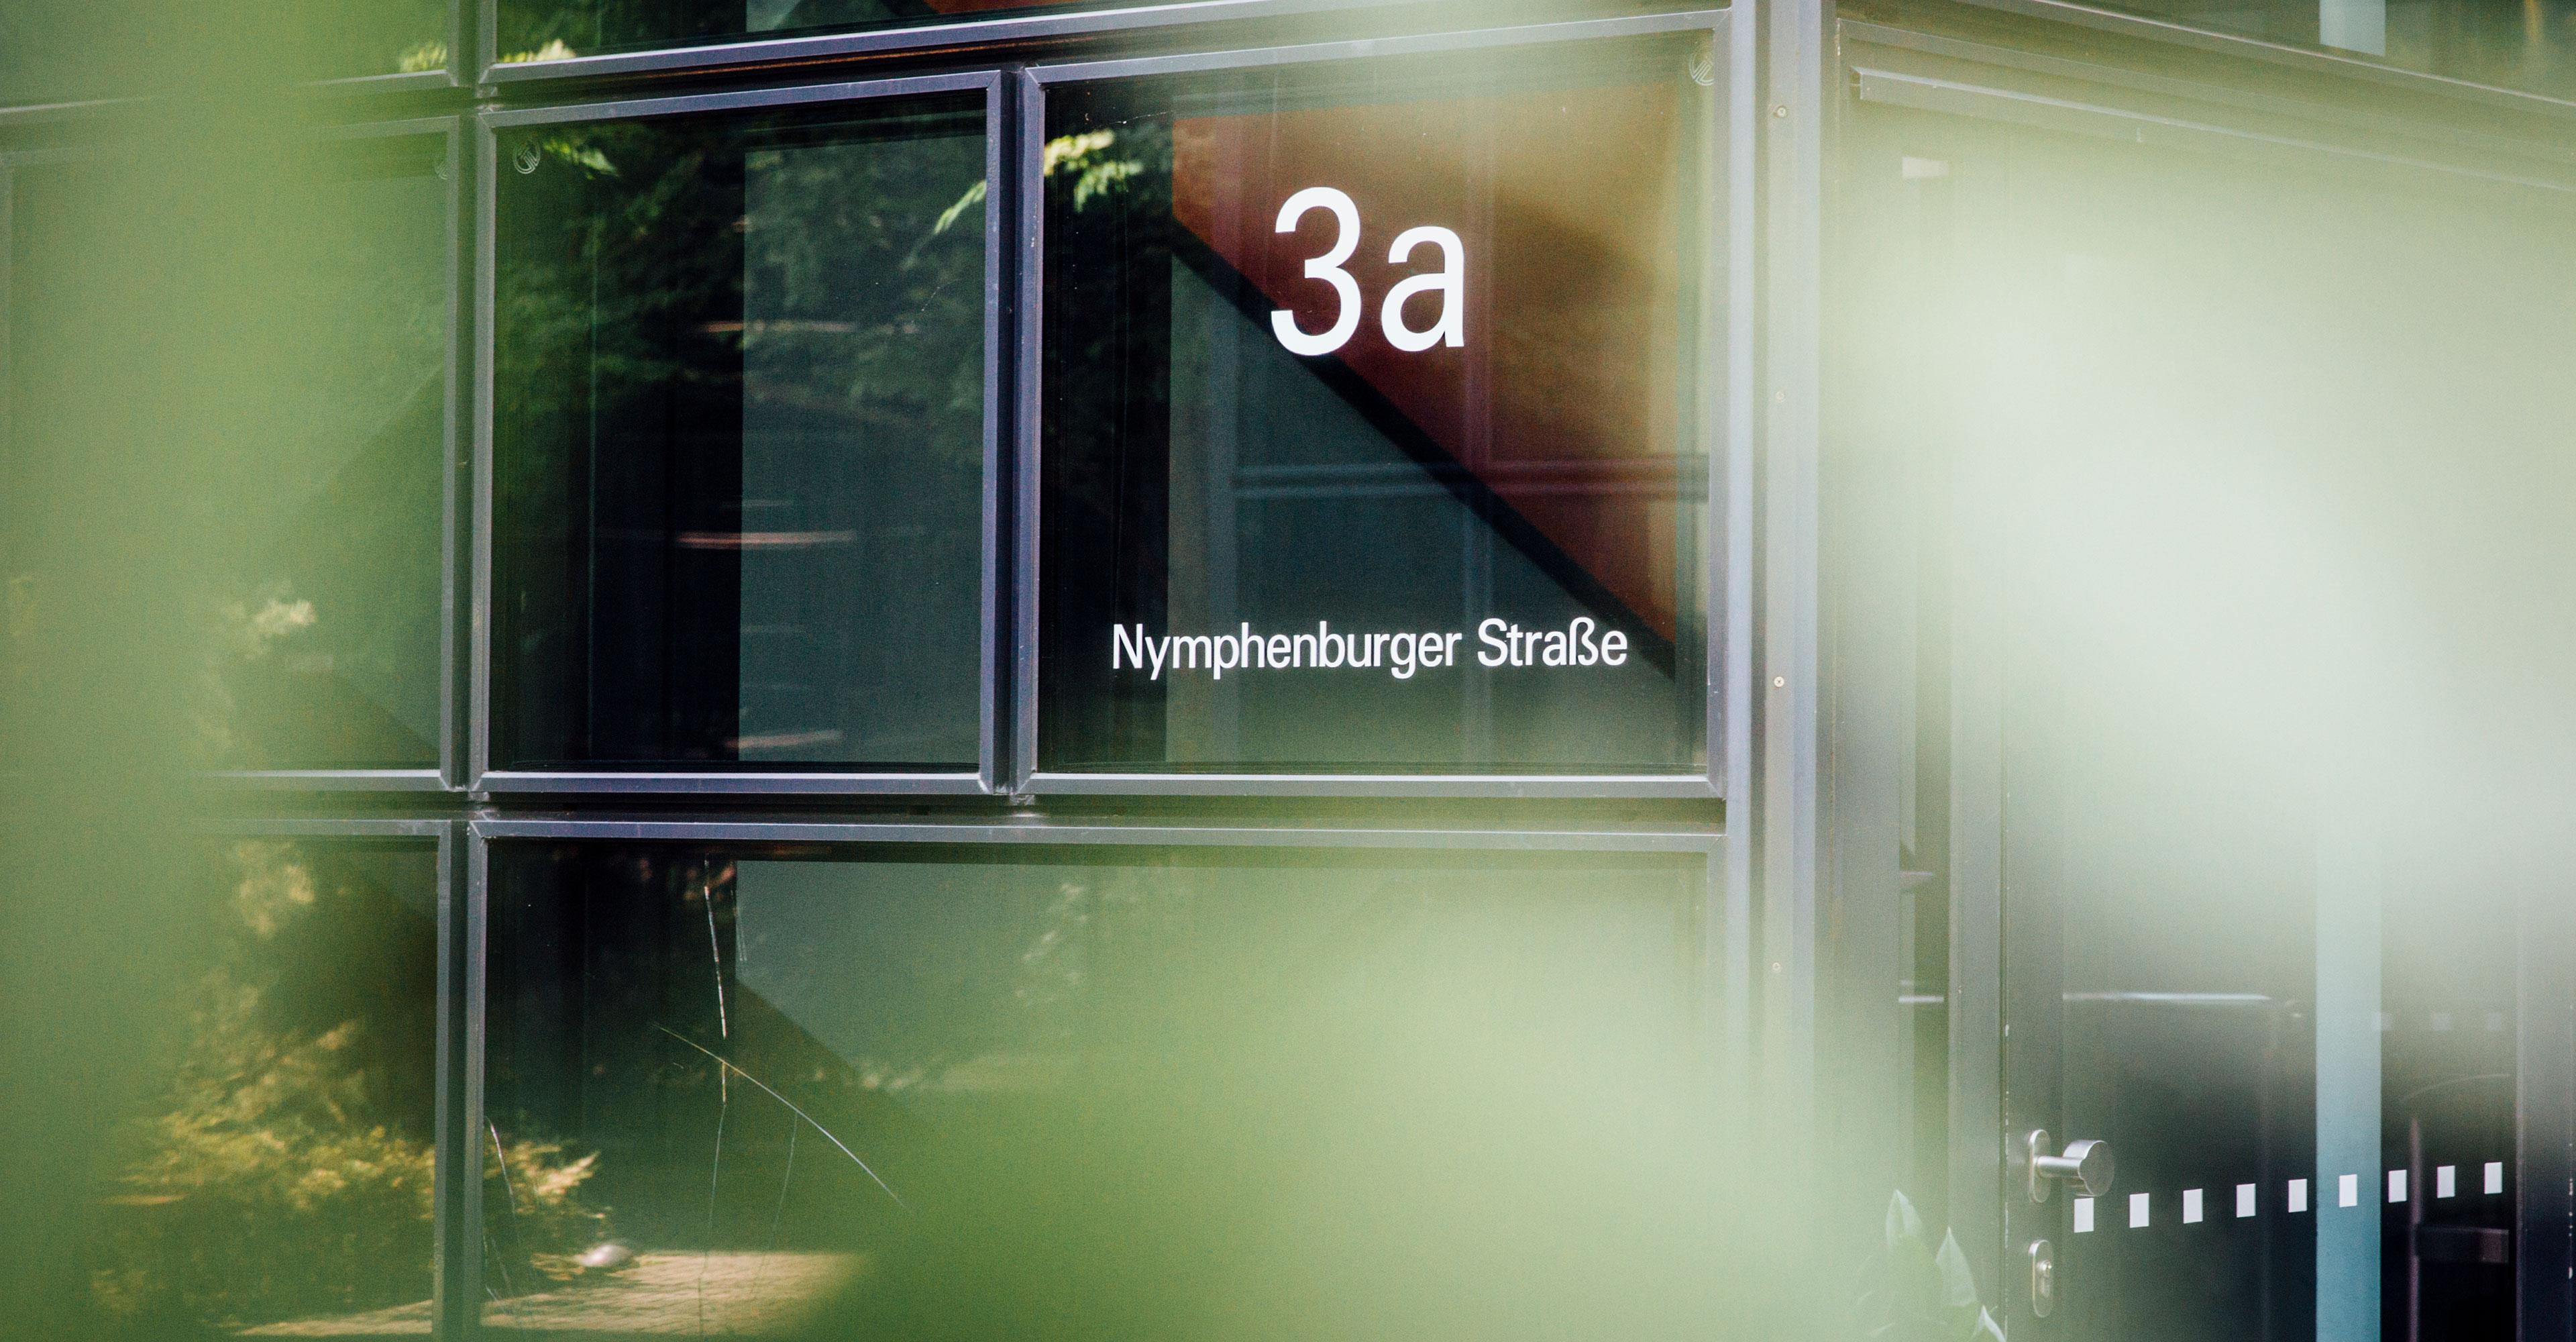 Blomberg legal Anwälte München